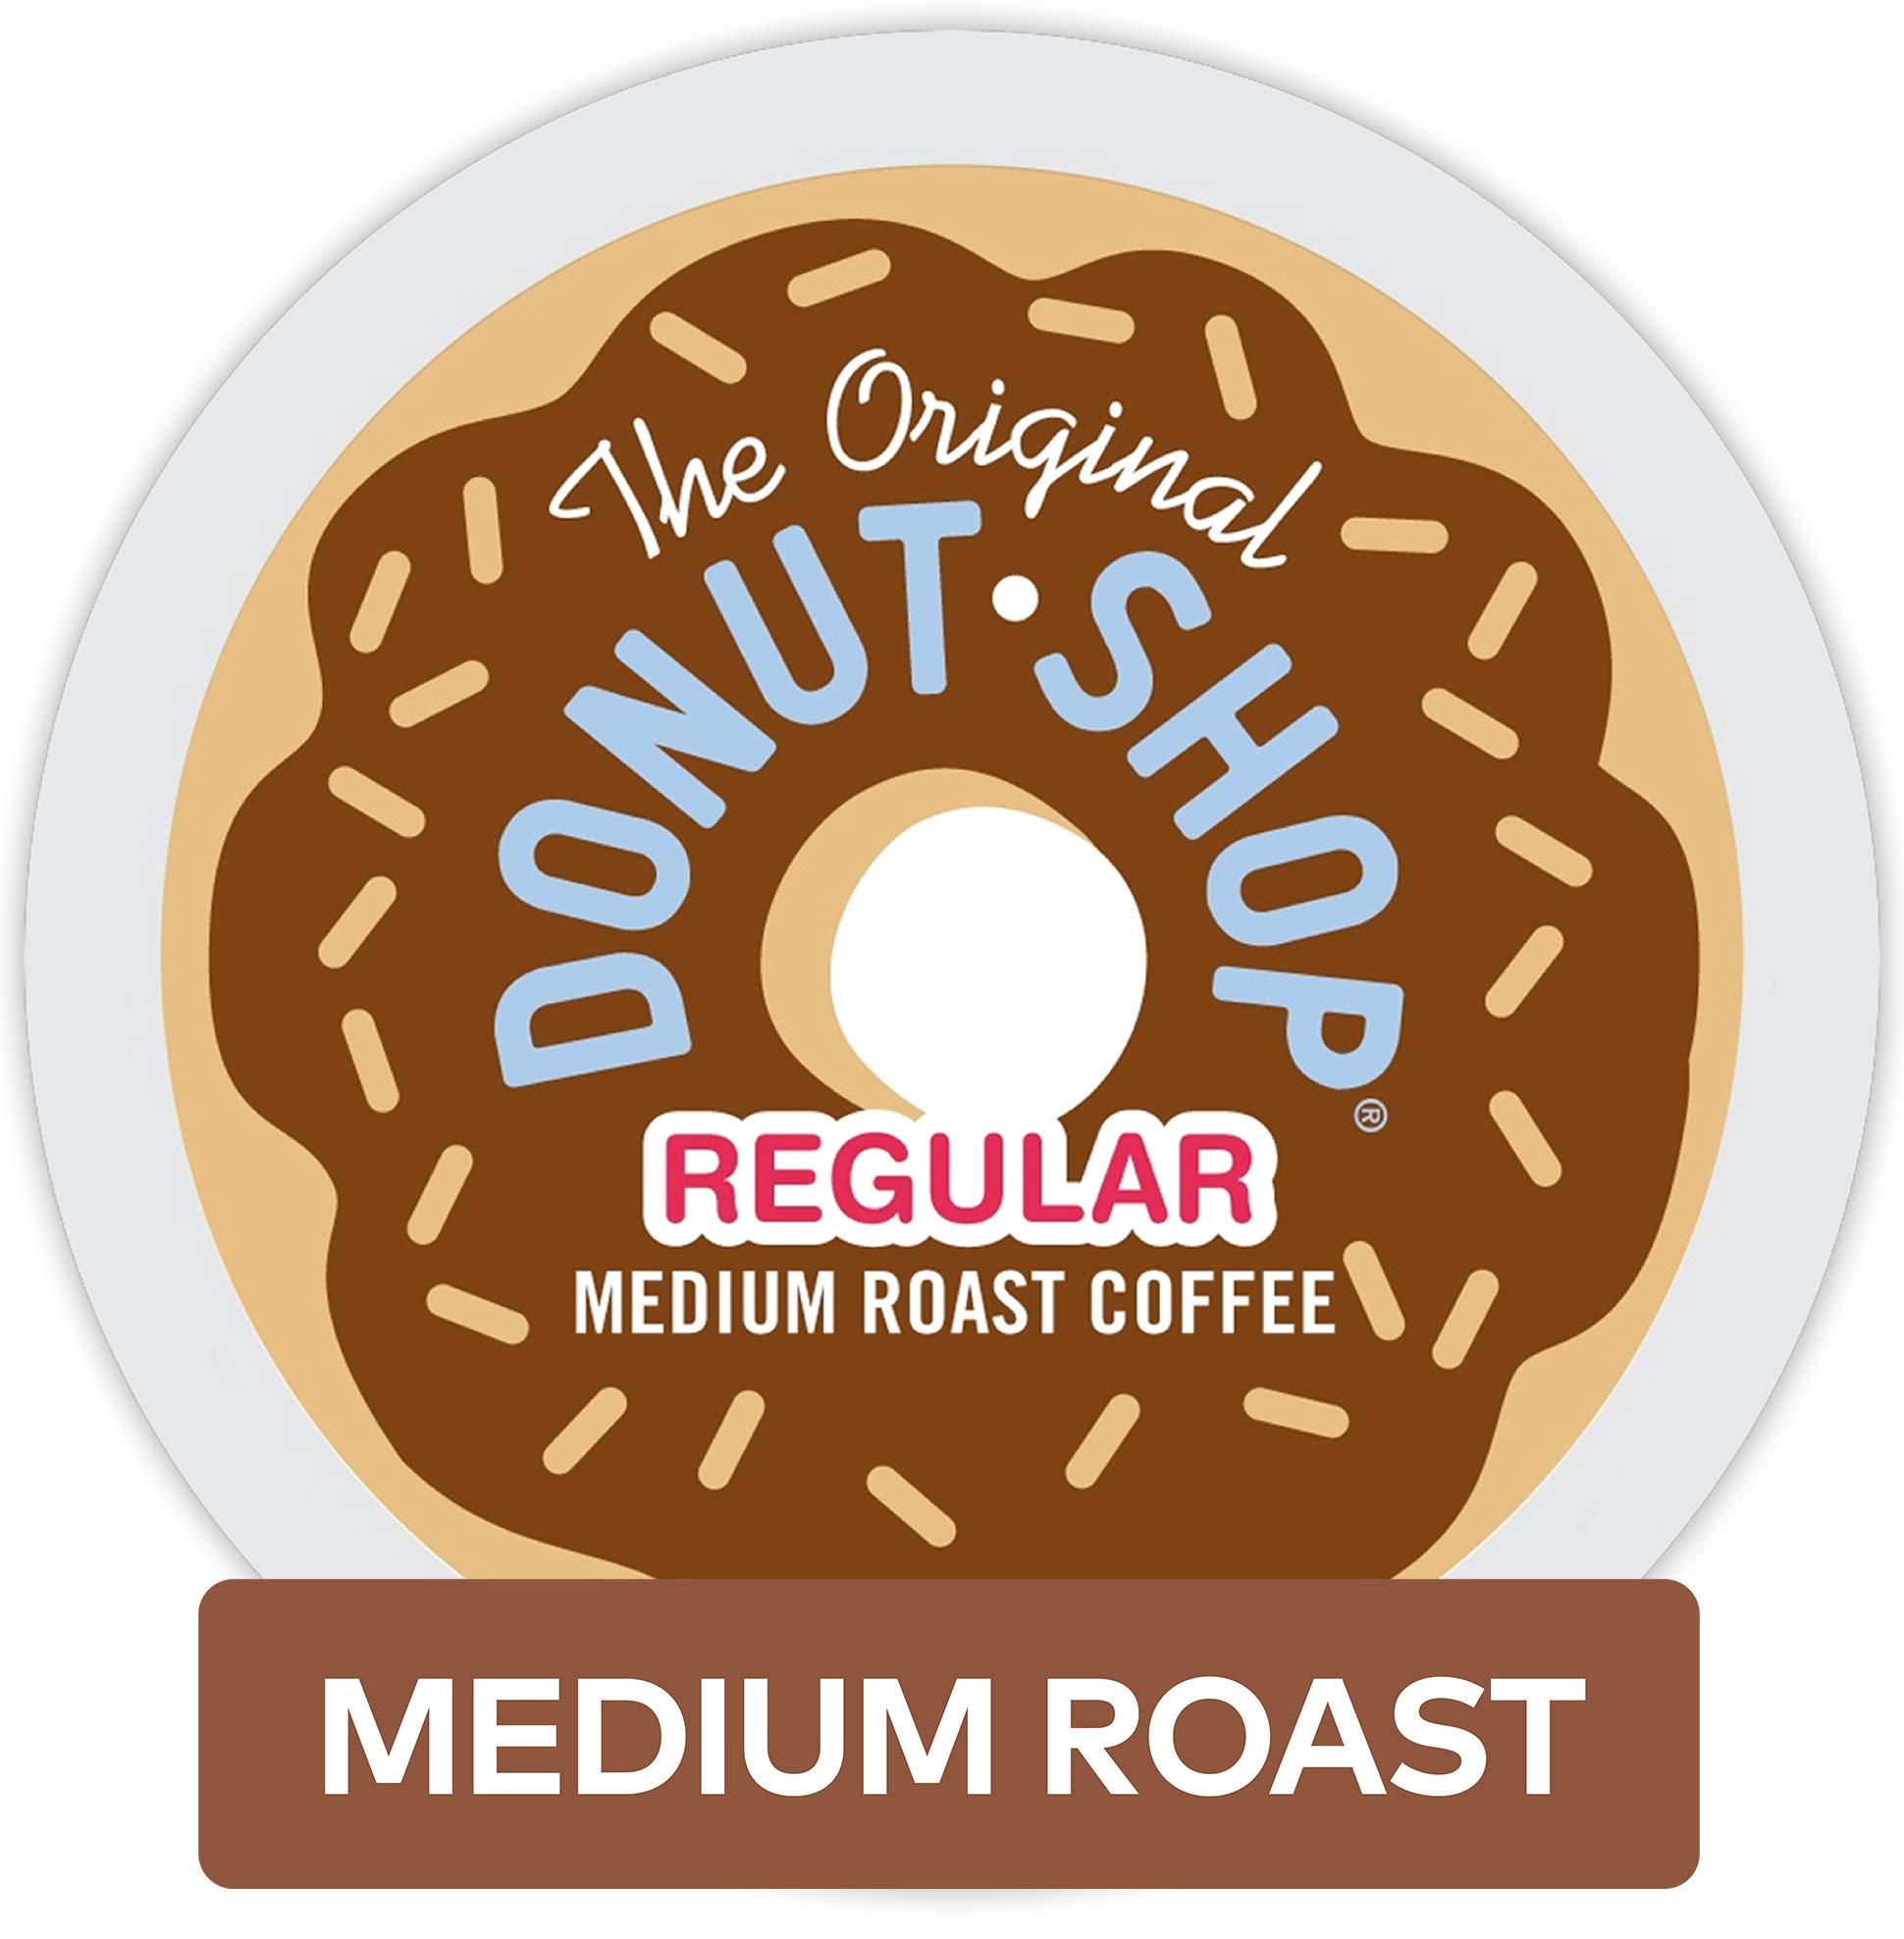 The Original Donut Shop Keurig Single-Serve K-Cup Pods, Regular Medium Roast Coffee, 72 Count by The Original Donut Shop